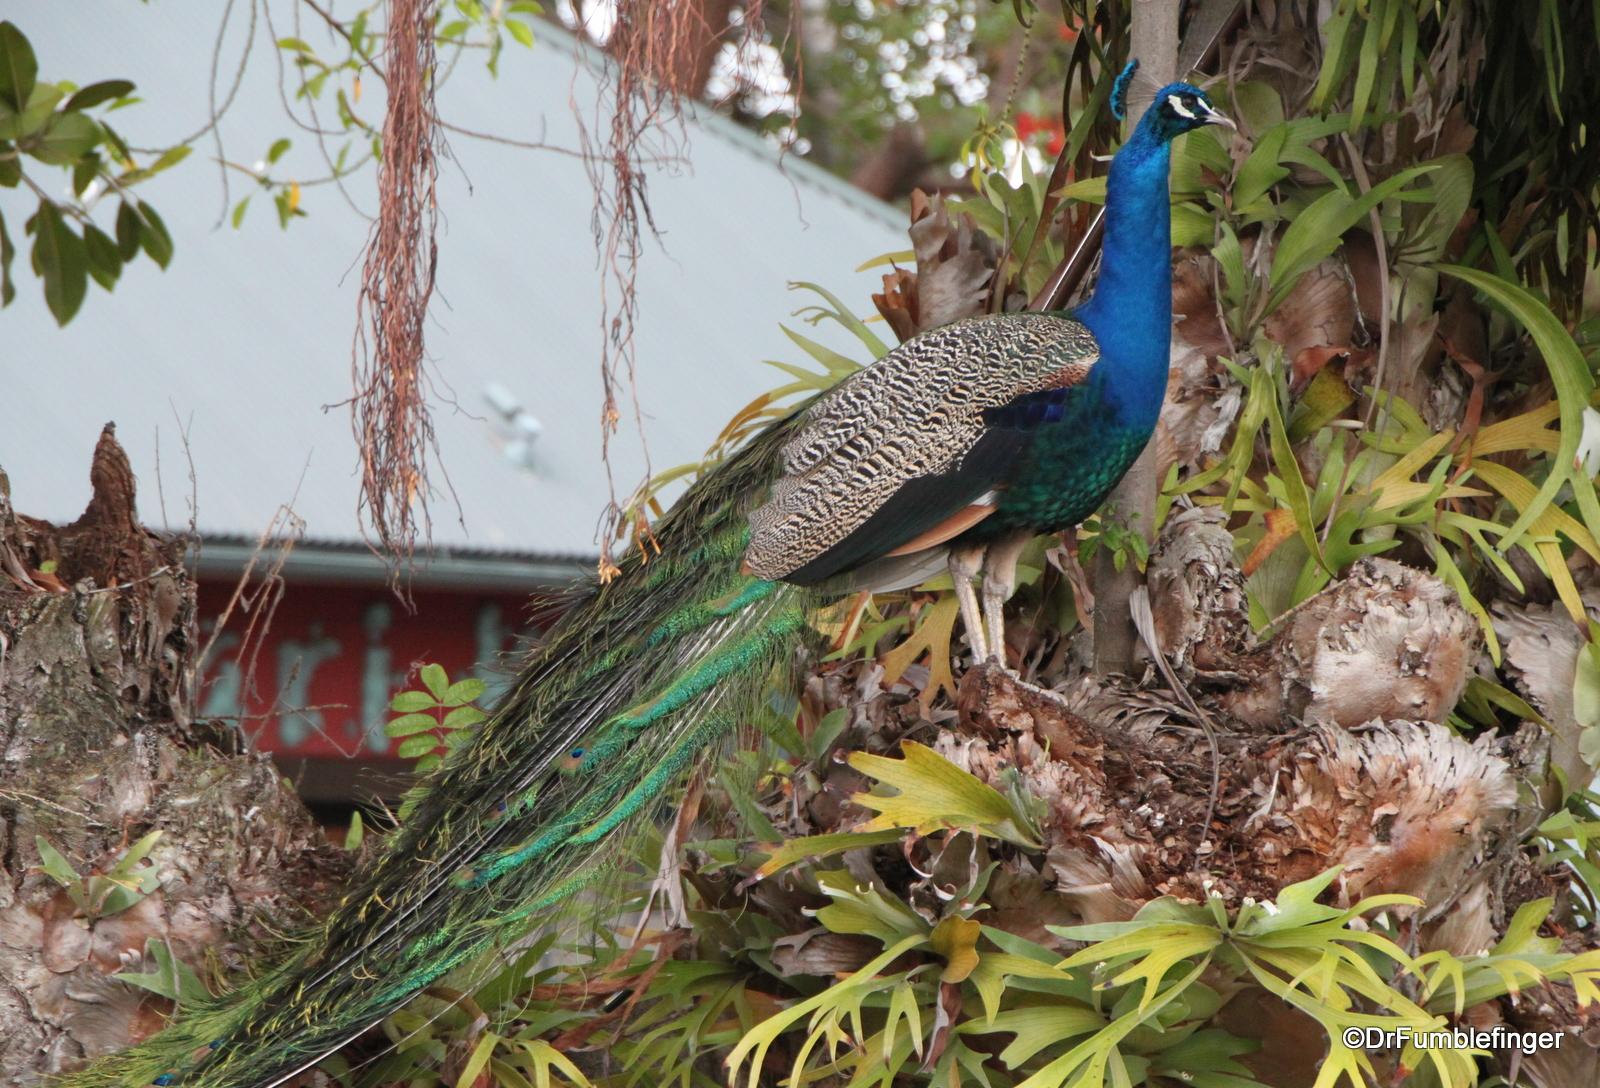 San Diego Zoo, Peacock